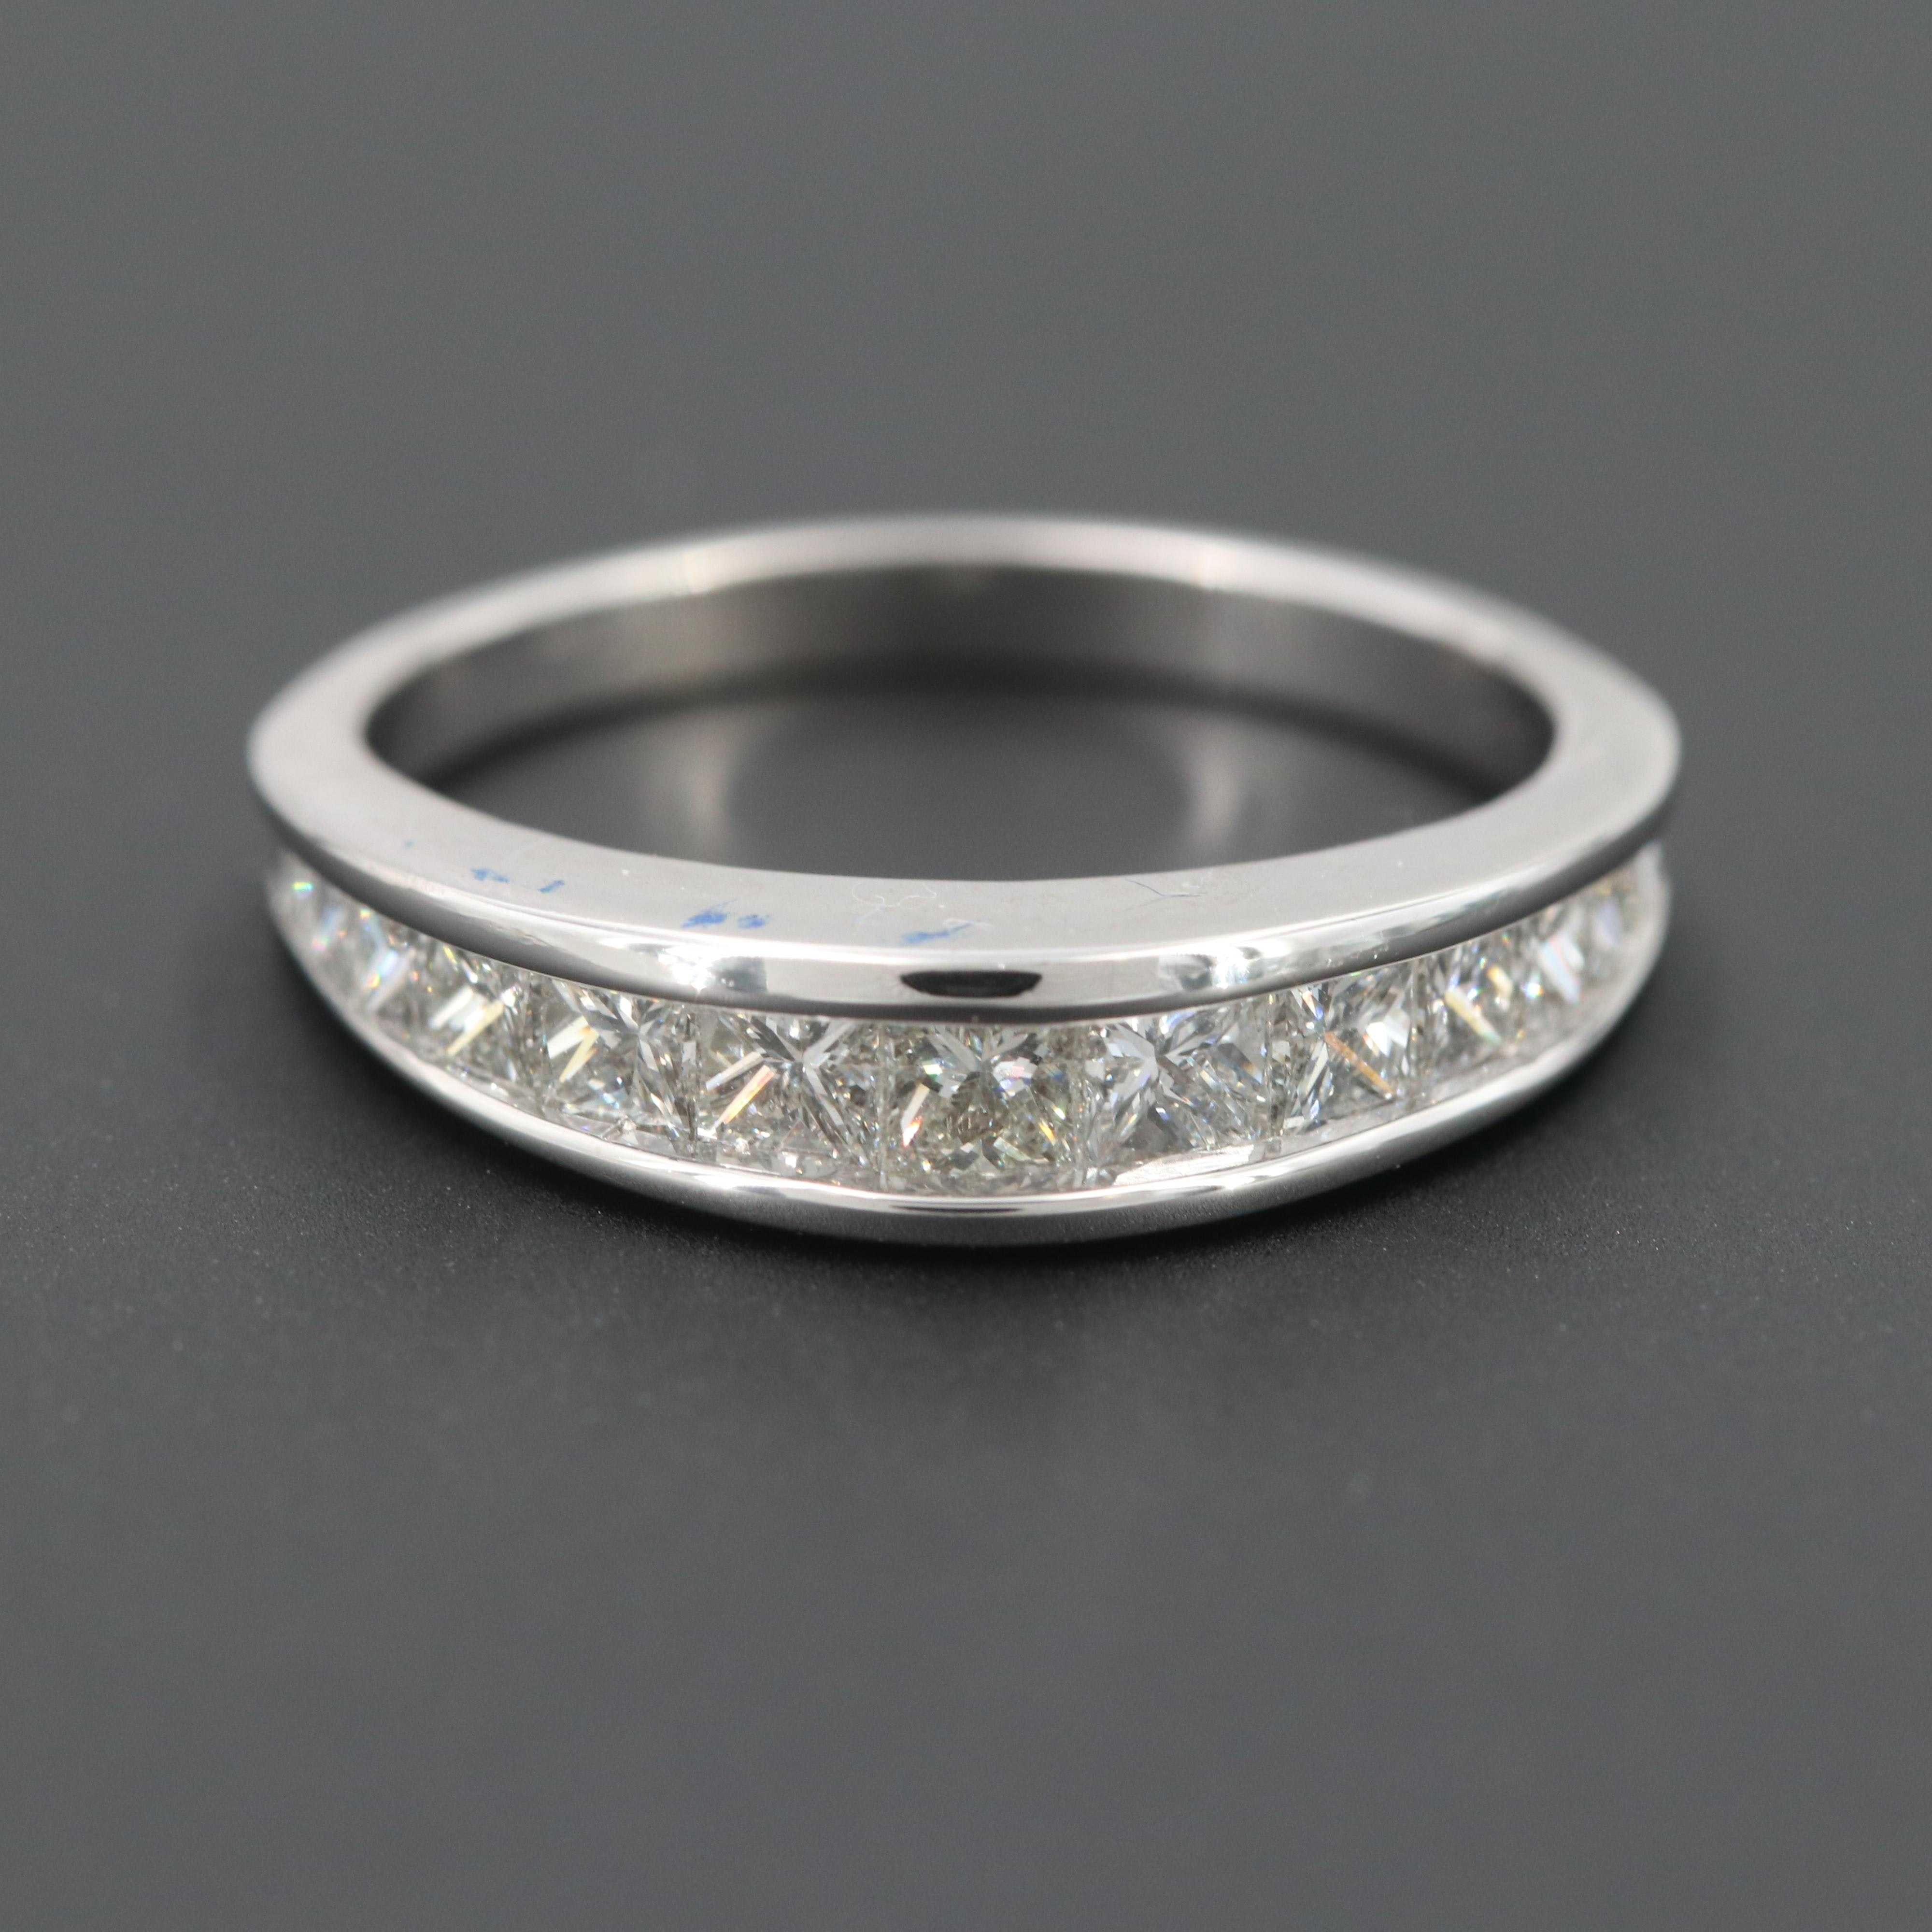 14K White Gold 0.97 CTW Diamond Ring